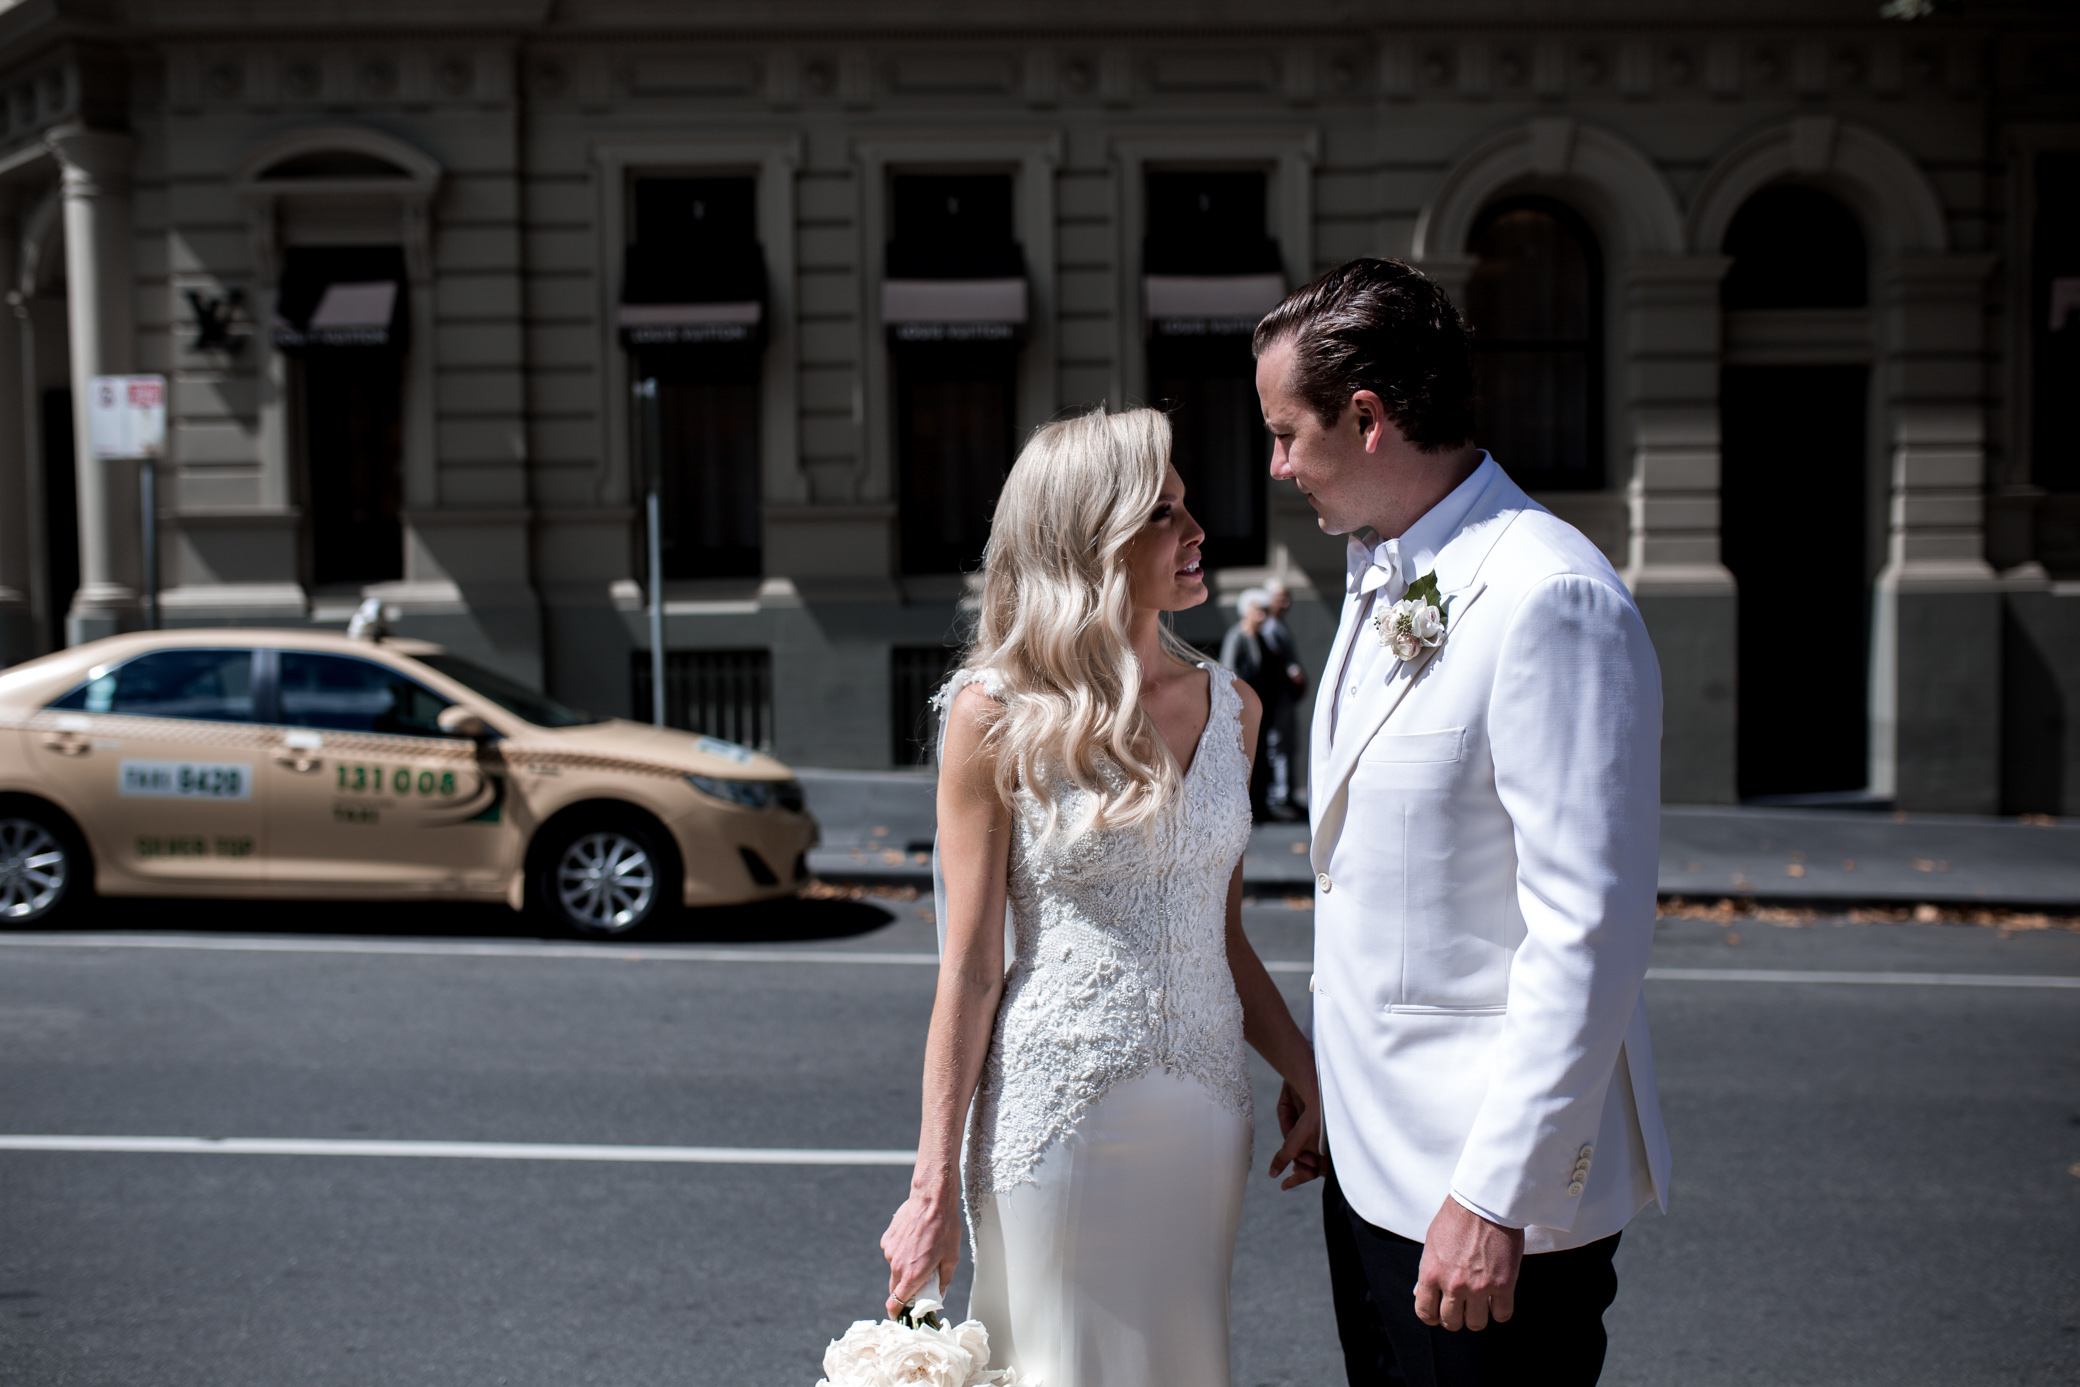 mr-theodore_white-vine-photography_same-sex-wedding-directory16.jpg